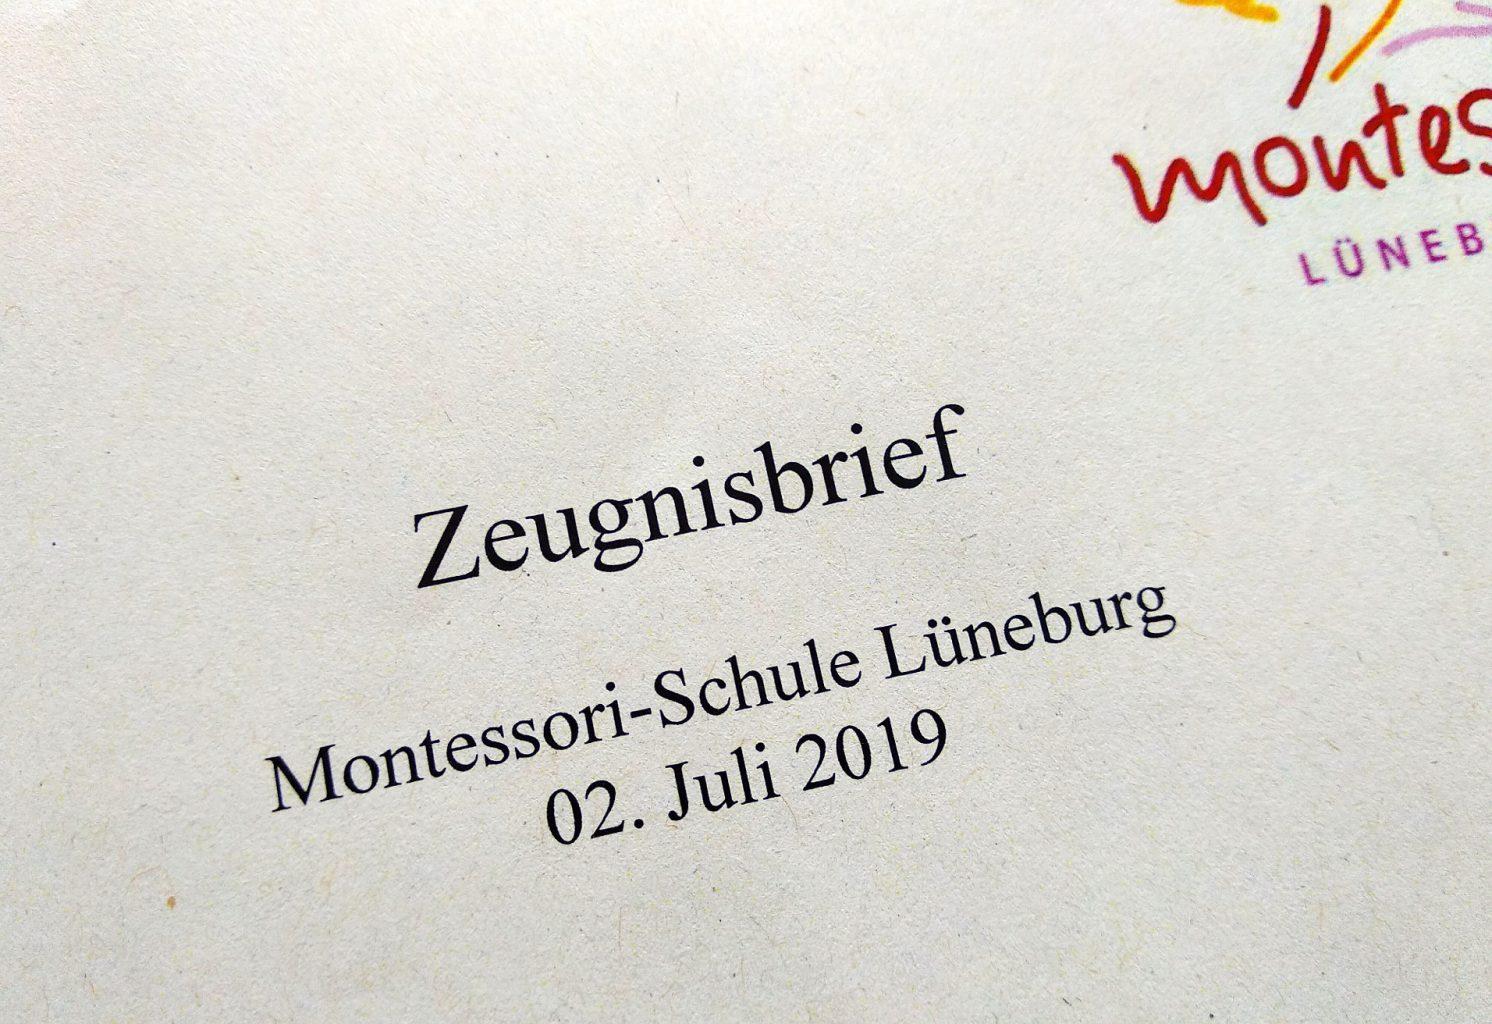 Montessori-Schule Zeugnisbrief